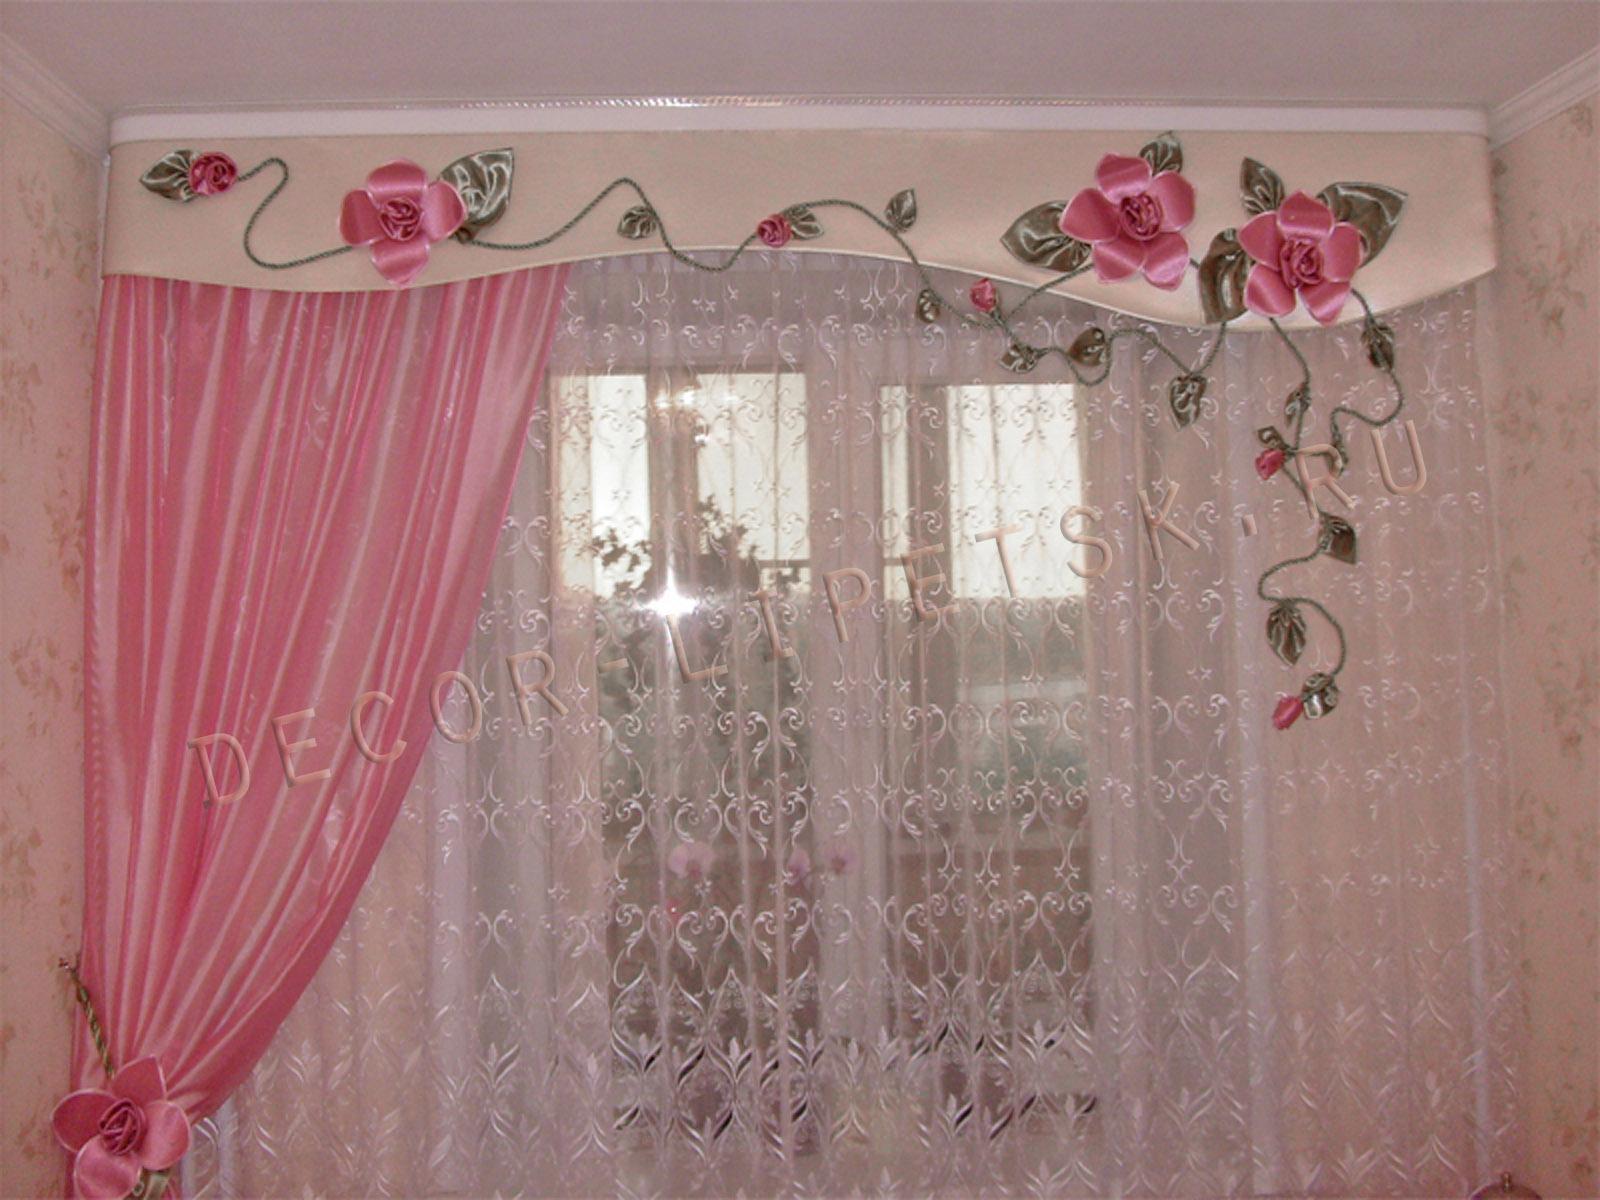 Фото ламбрекенов с аппликацией цветов